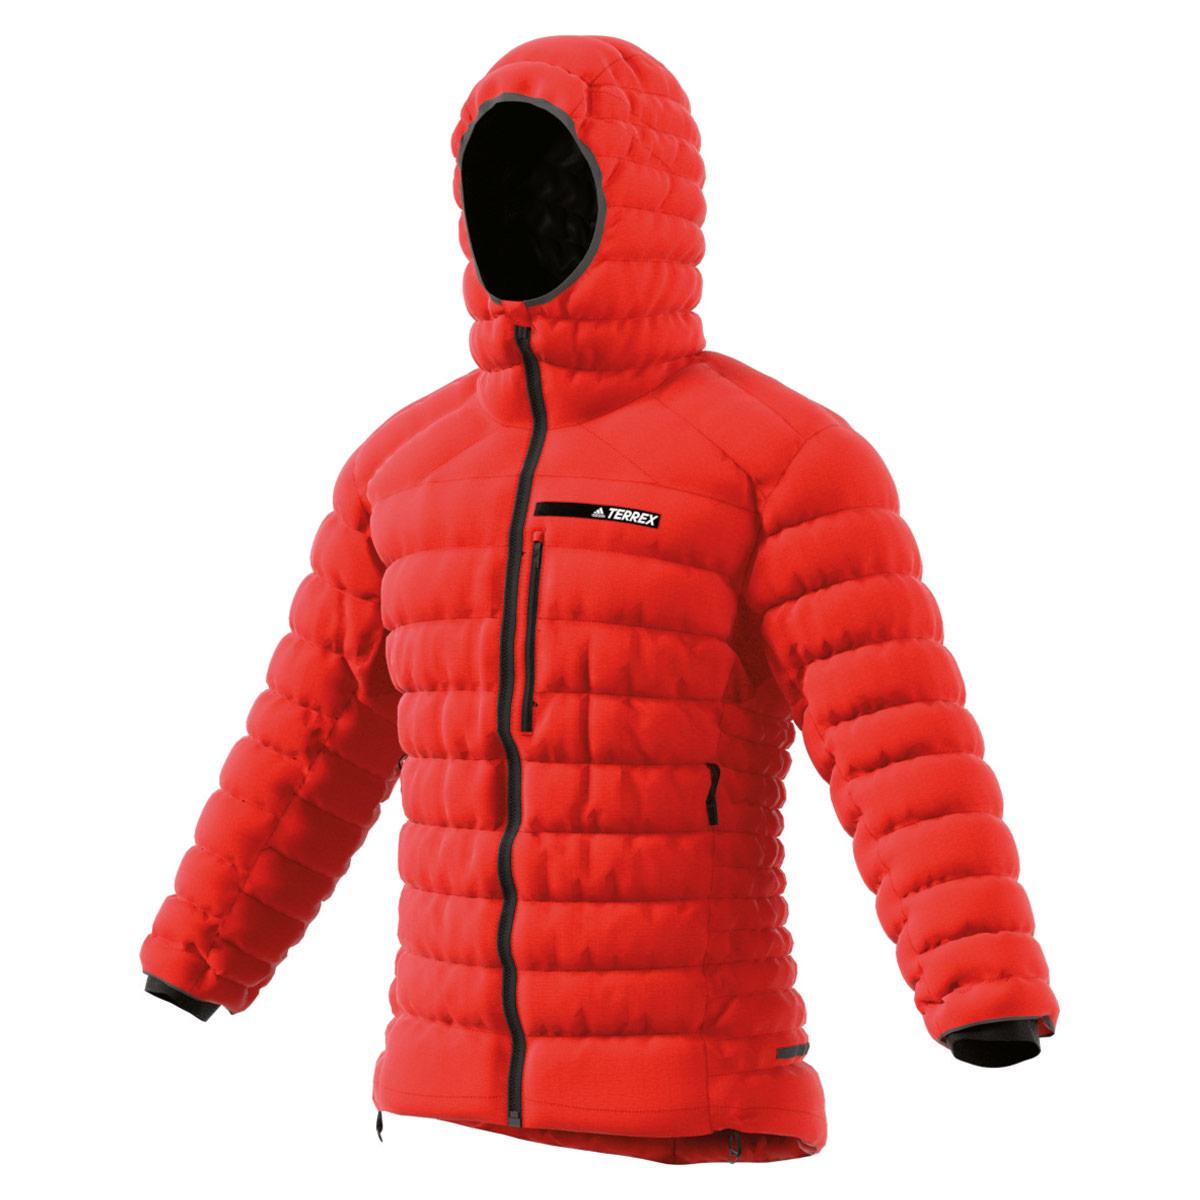 Homme Adidas Hooded Down Vestes Rouge Jacket Blousons Climaheat Terrex Pour XZukPi